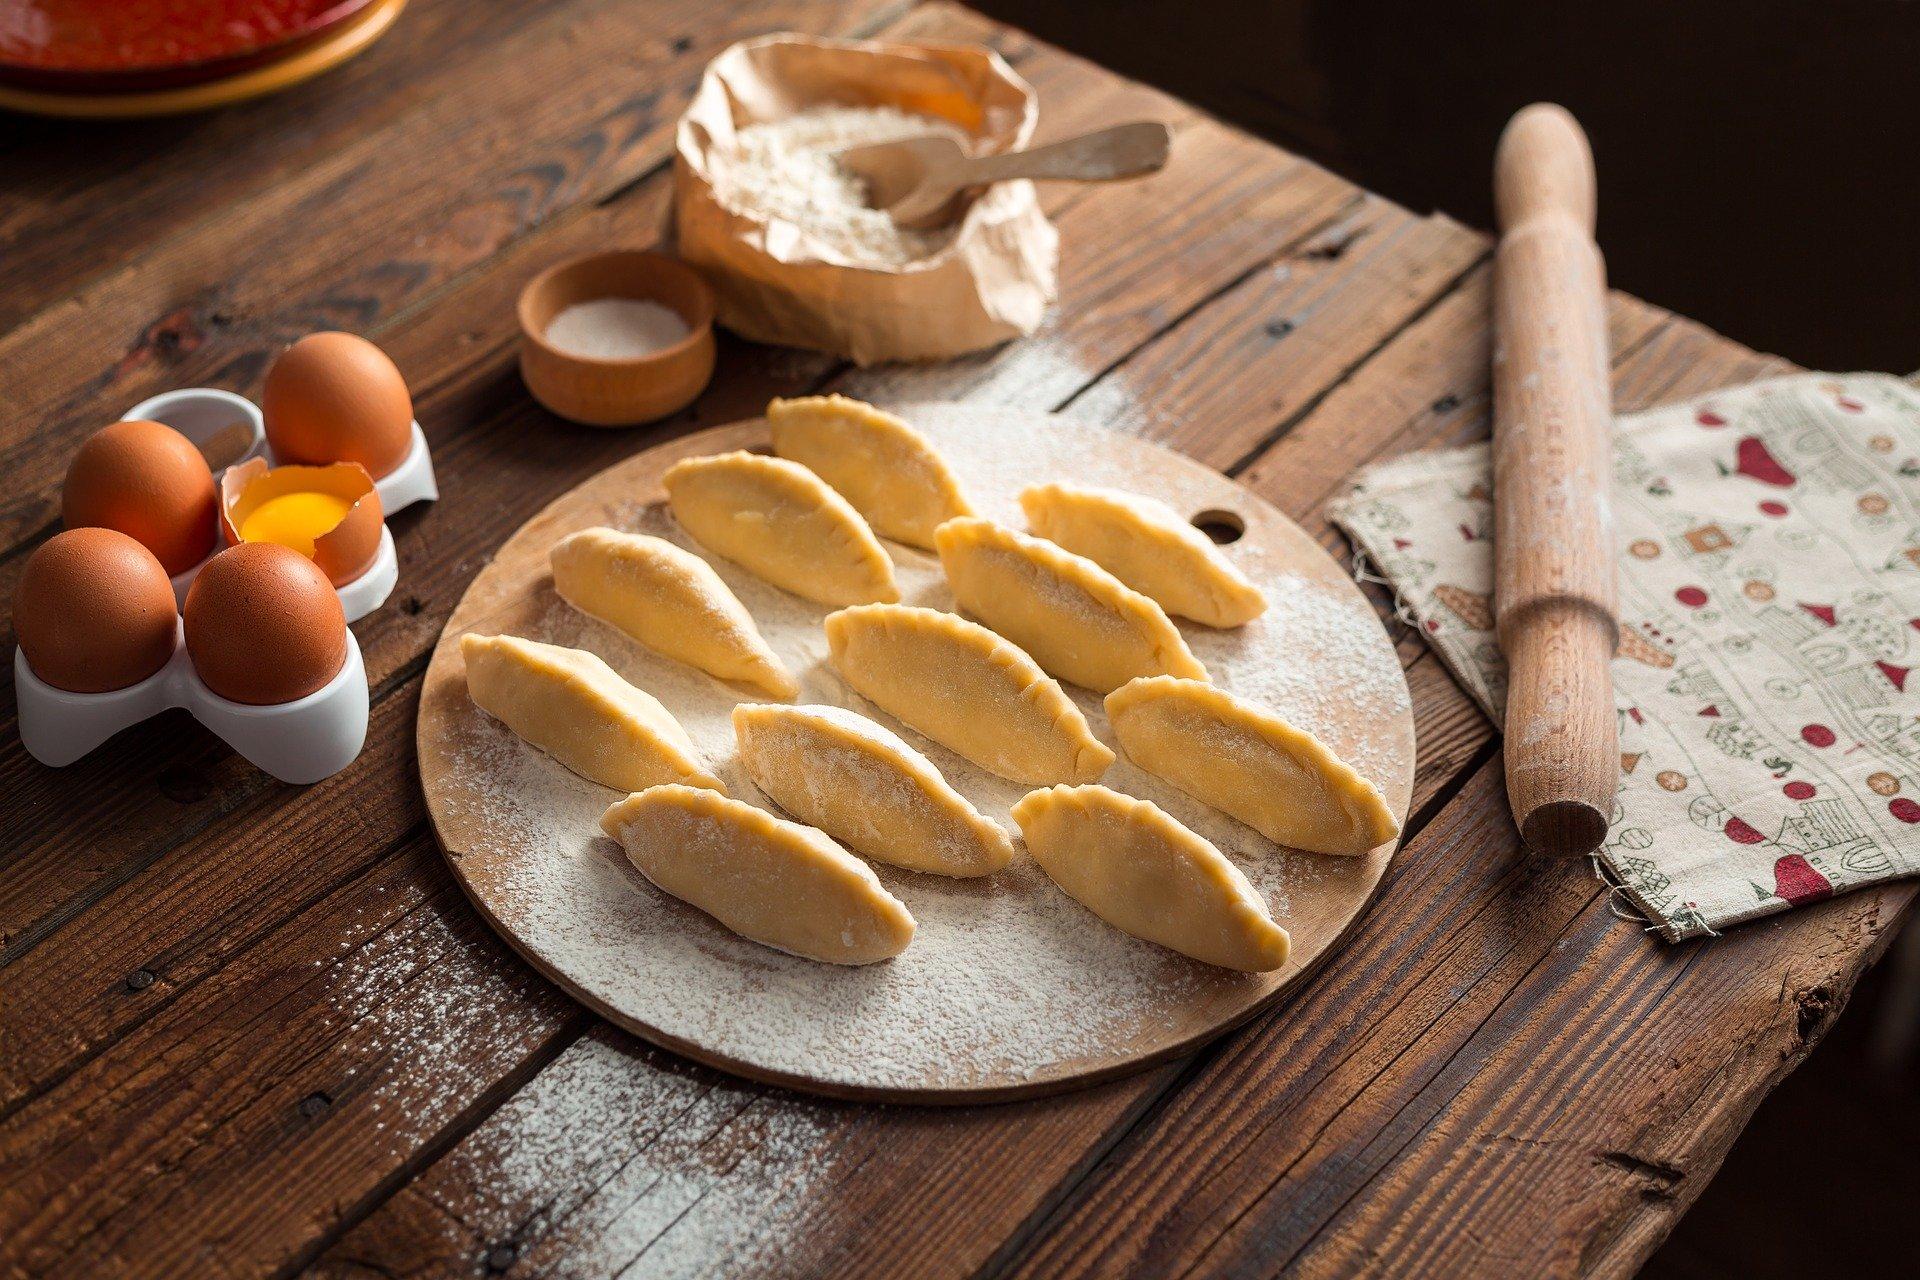 Food Photography Course By Yehia El Alaily - Artandcreativity.com